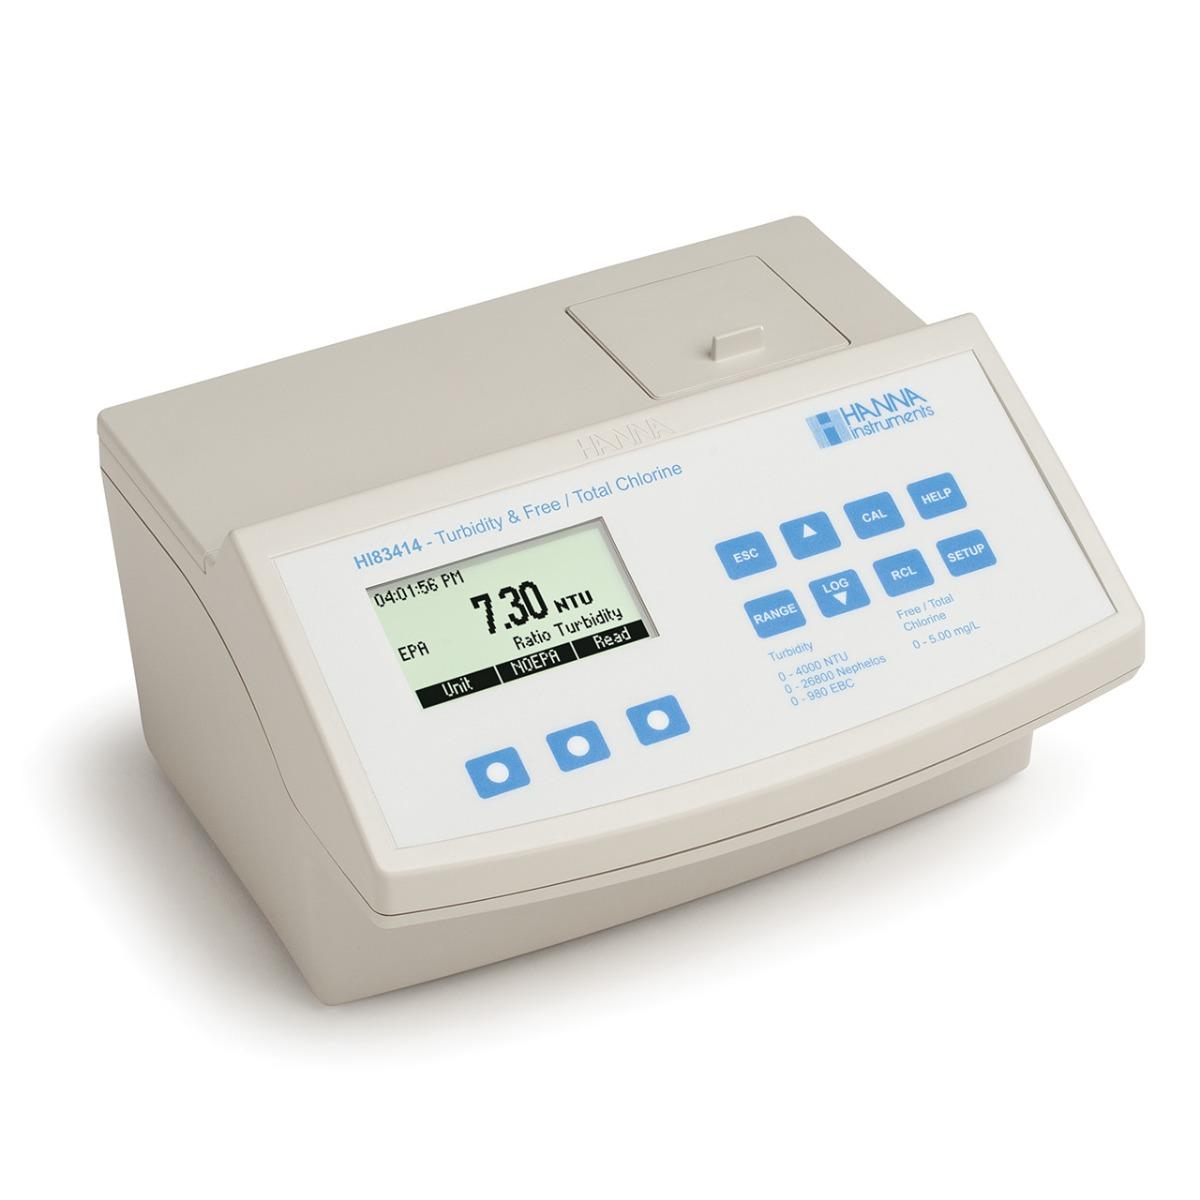 HI83414 Turbidity and Chlorine Benchtop Meter